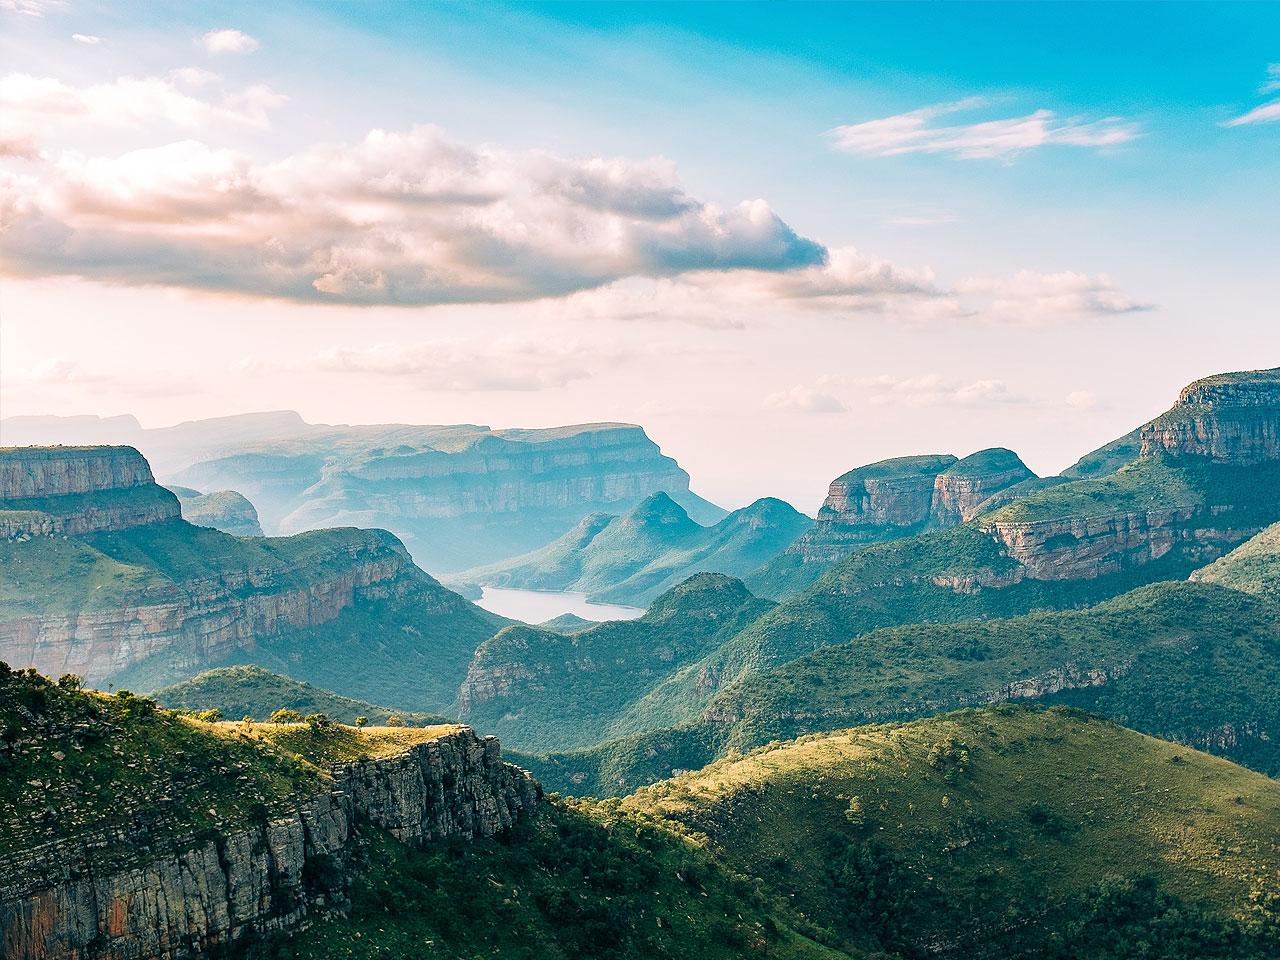 Mpumalanga inline image 5e43cec83a389